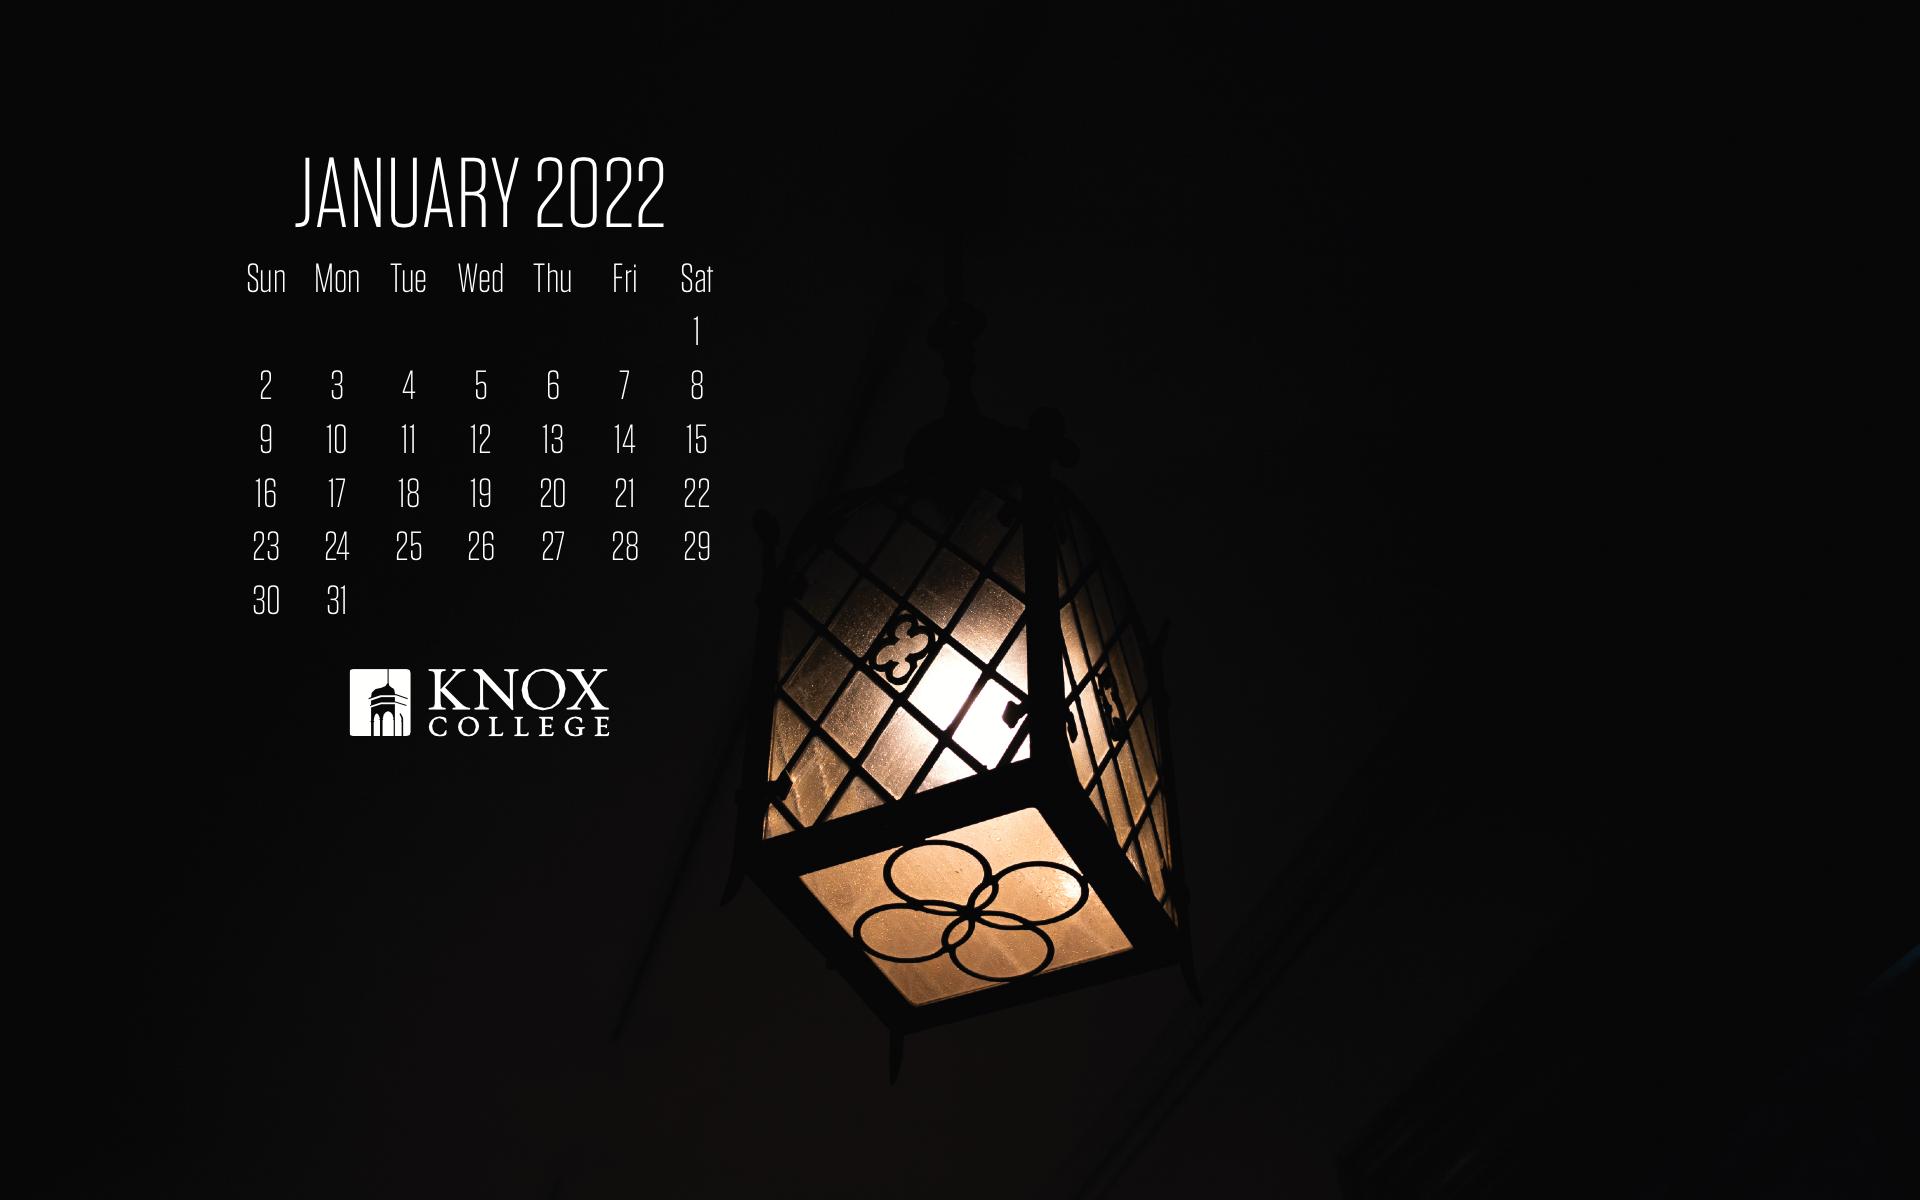 2022 Calendar Wallpaper.2022 Calendar Wallpapers Wallpaper Cave